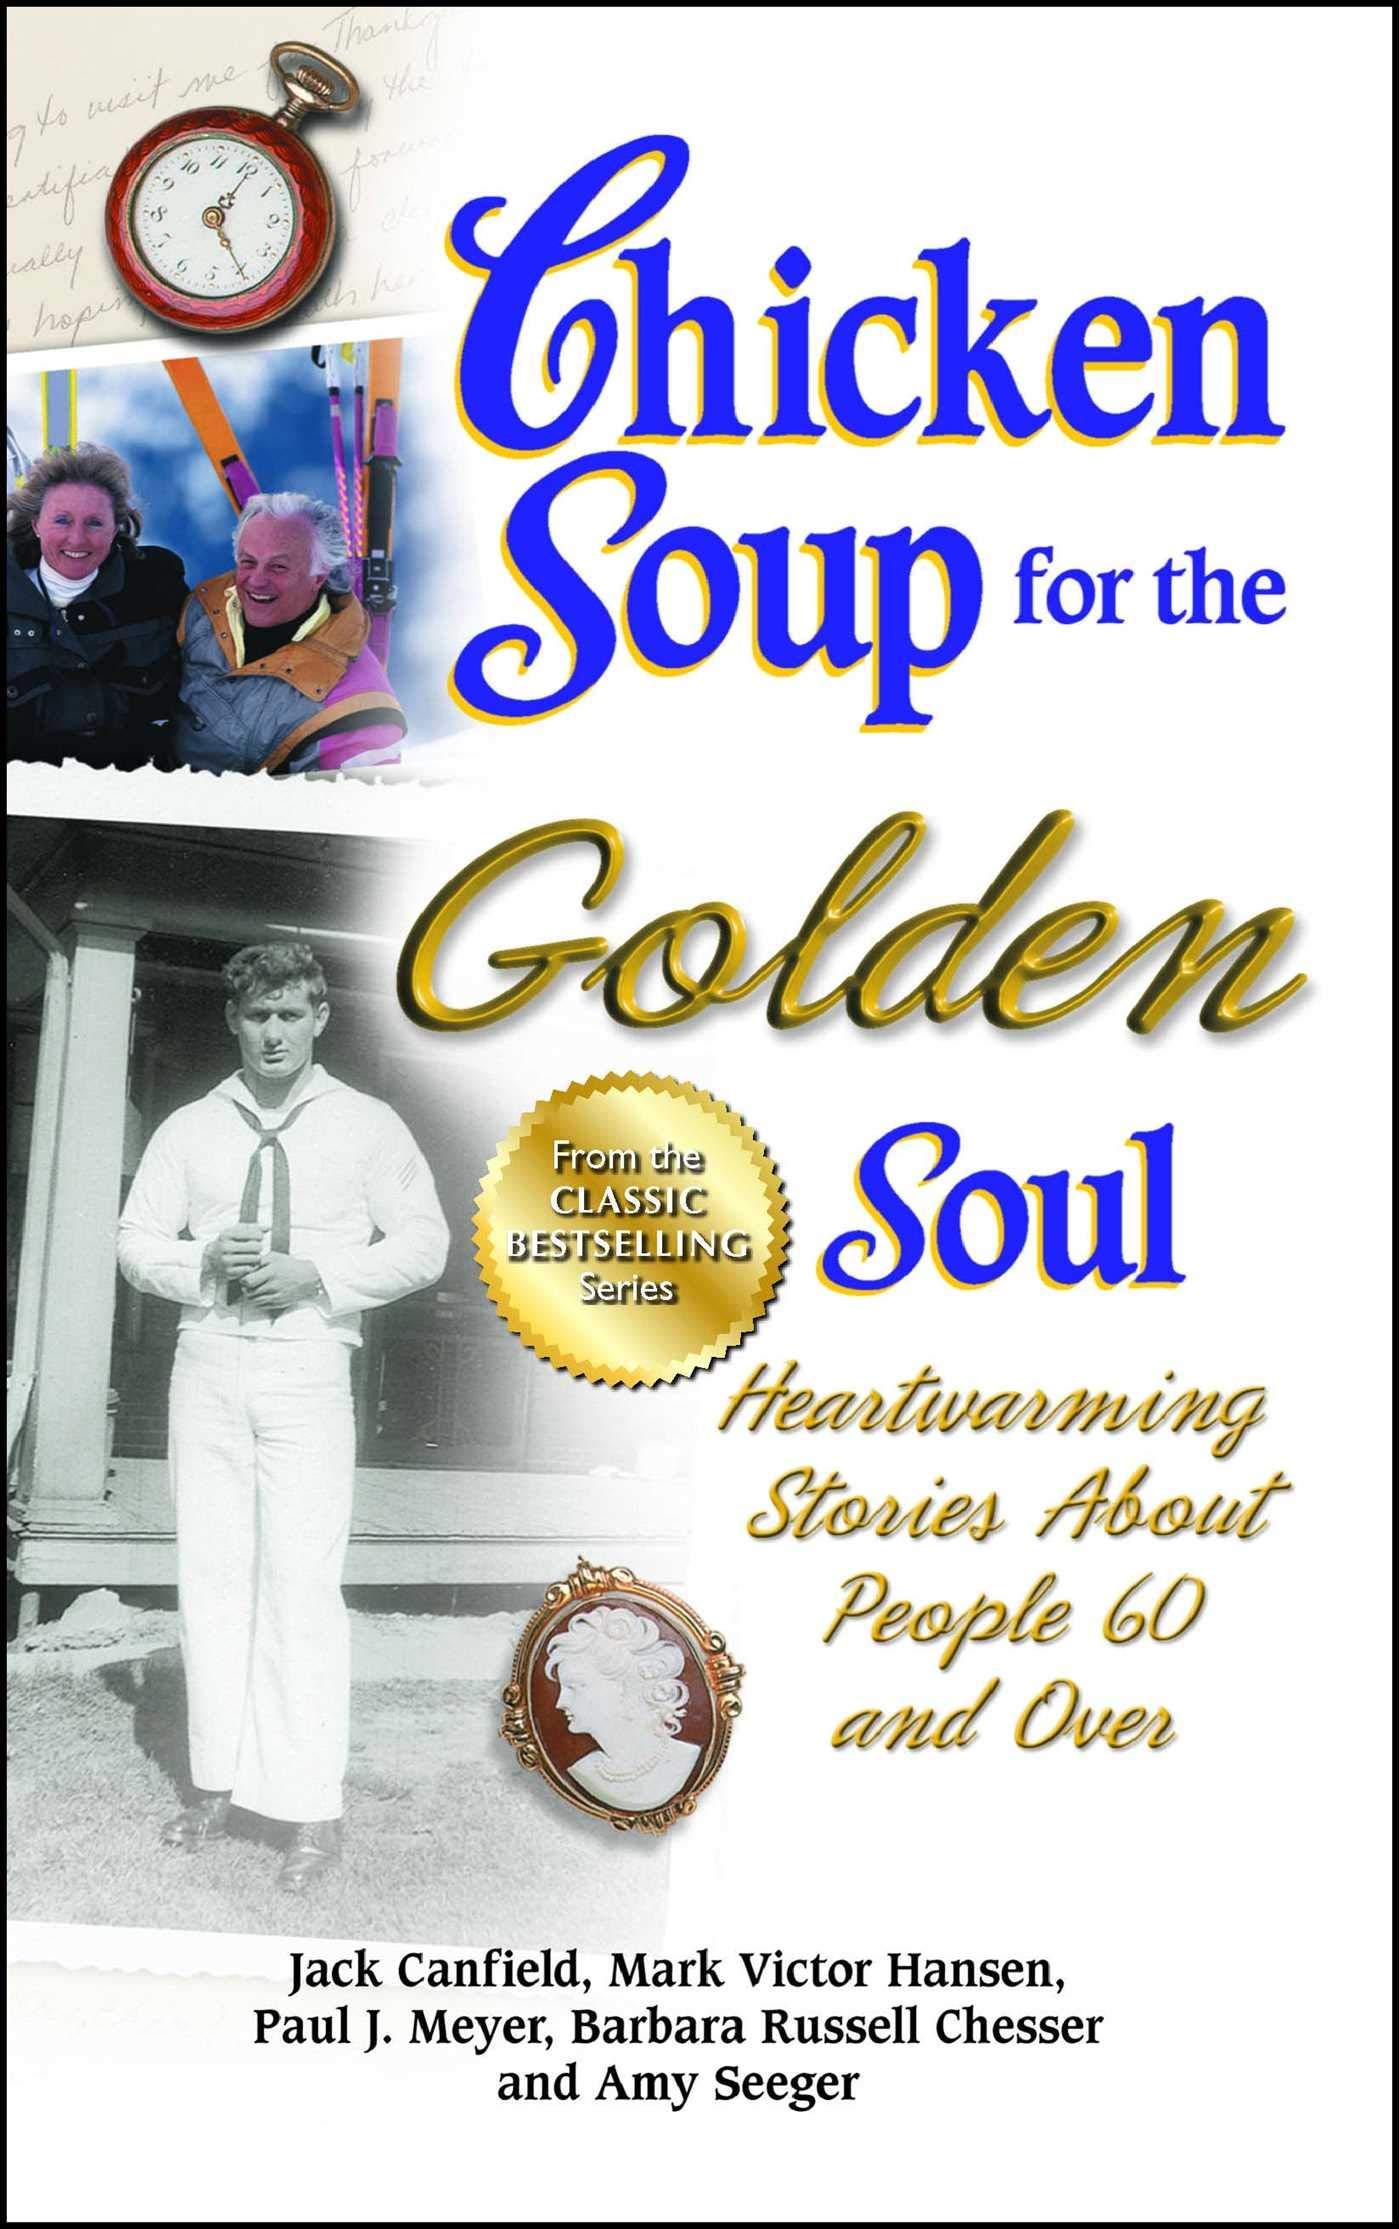 Chicken Soup Golden Soul Heartwarming product image